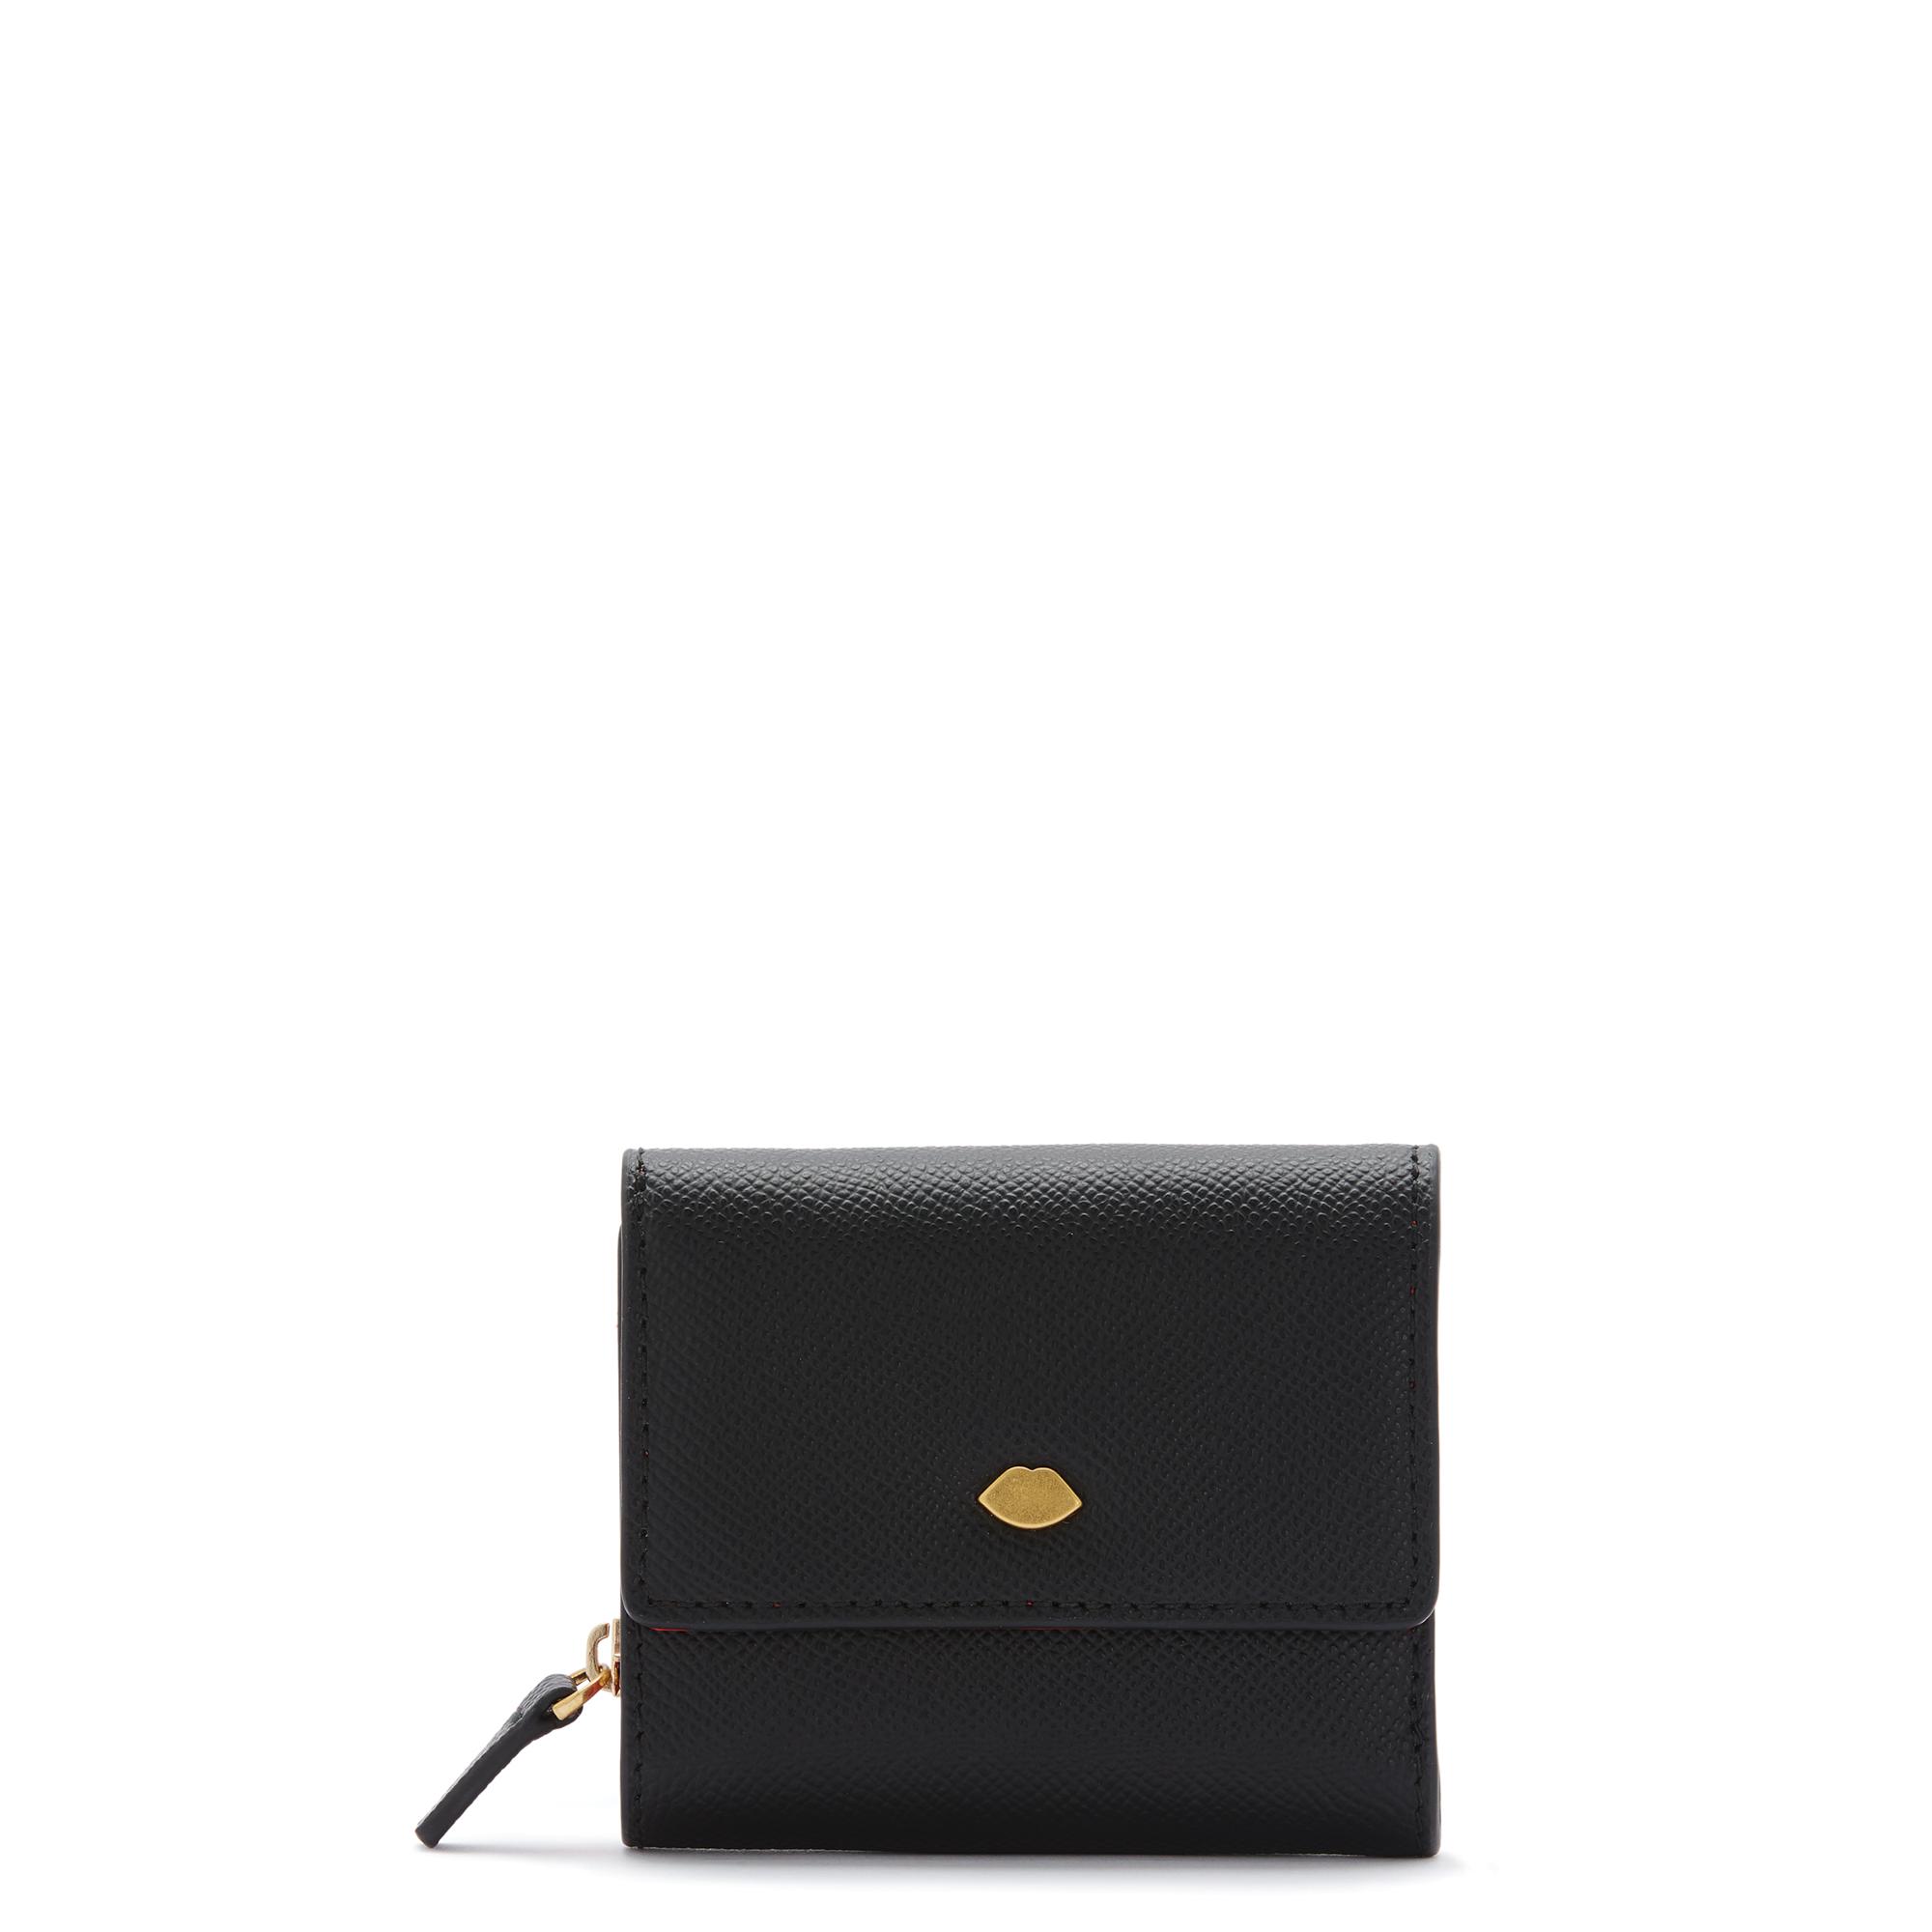 Black Leather Lip Pin Jodie Wallet